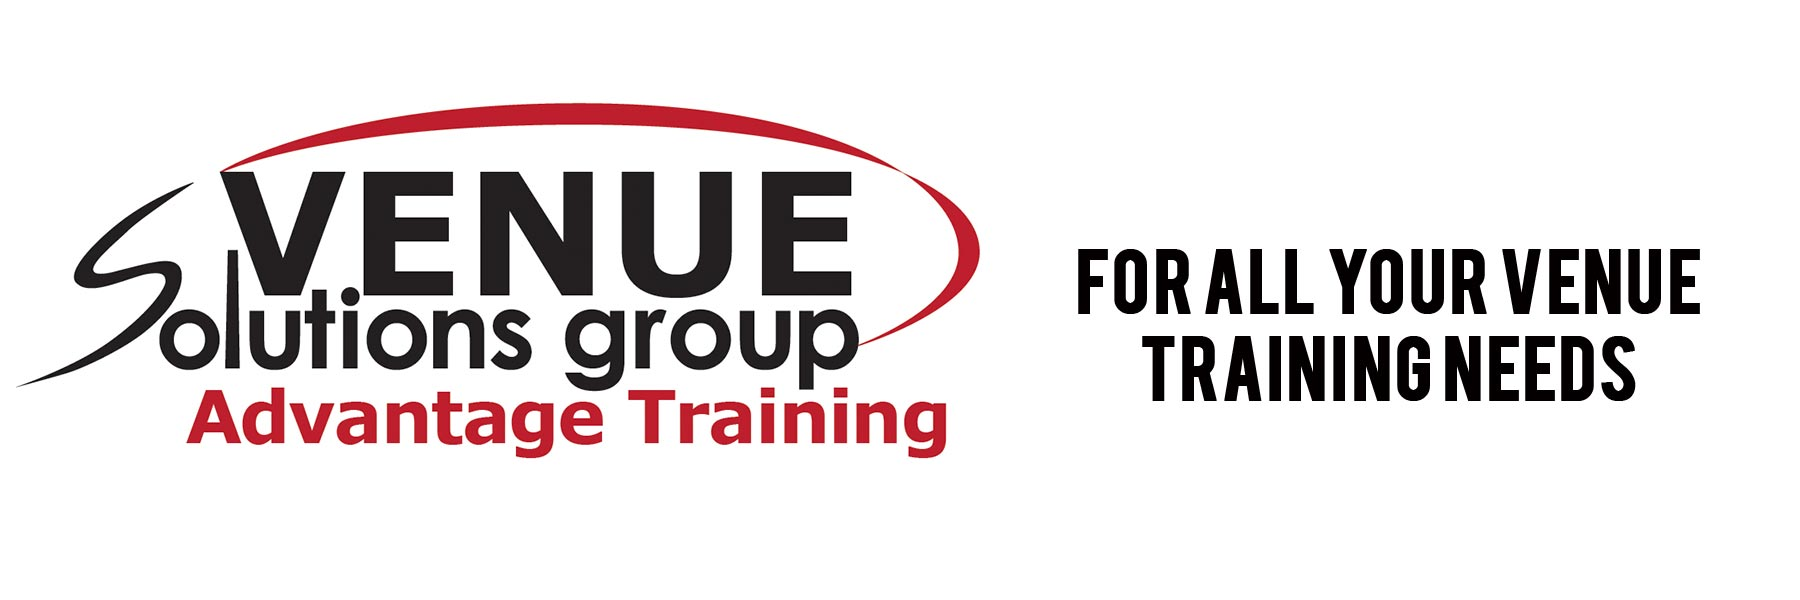 VSG Advantage Training